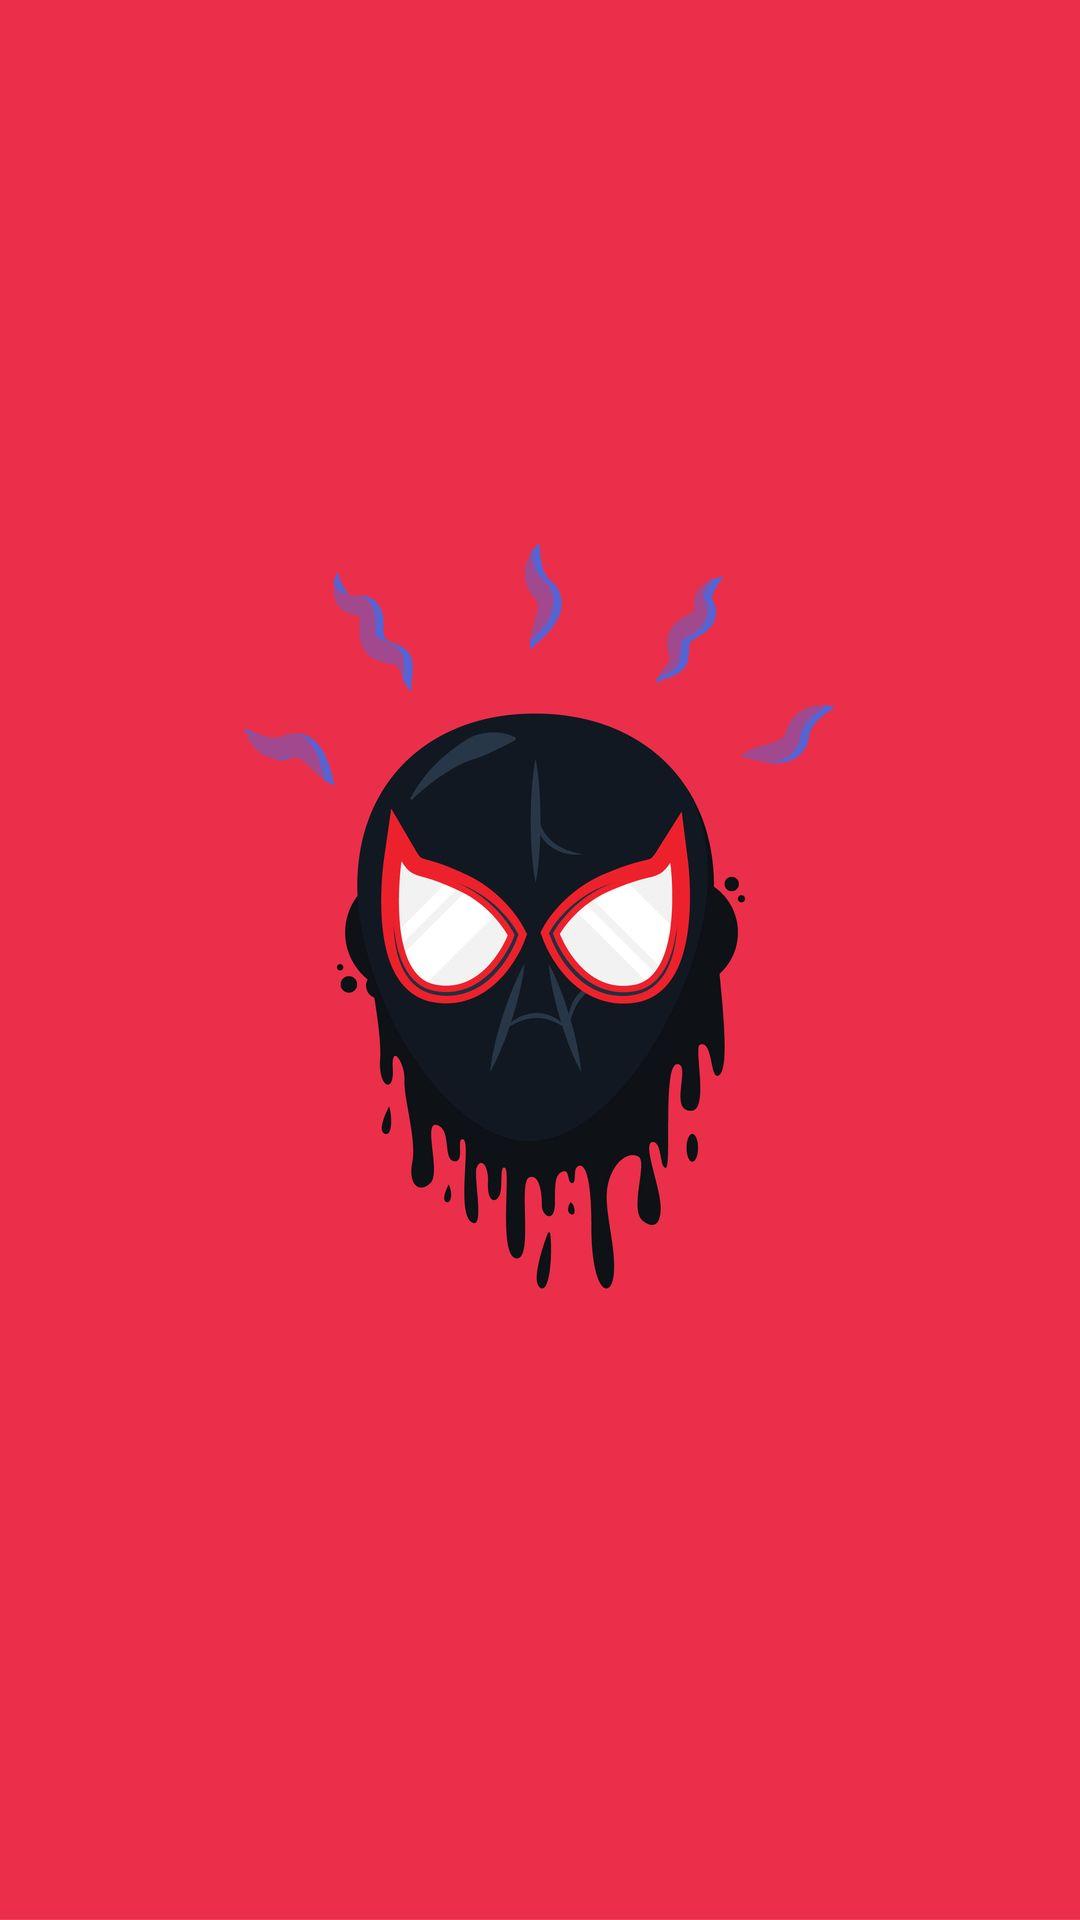 Miles Morales Spiderman Mask Iphone Wallpaper Spiderman Mask